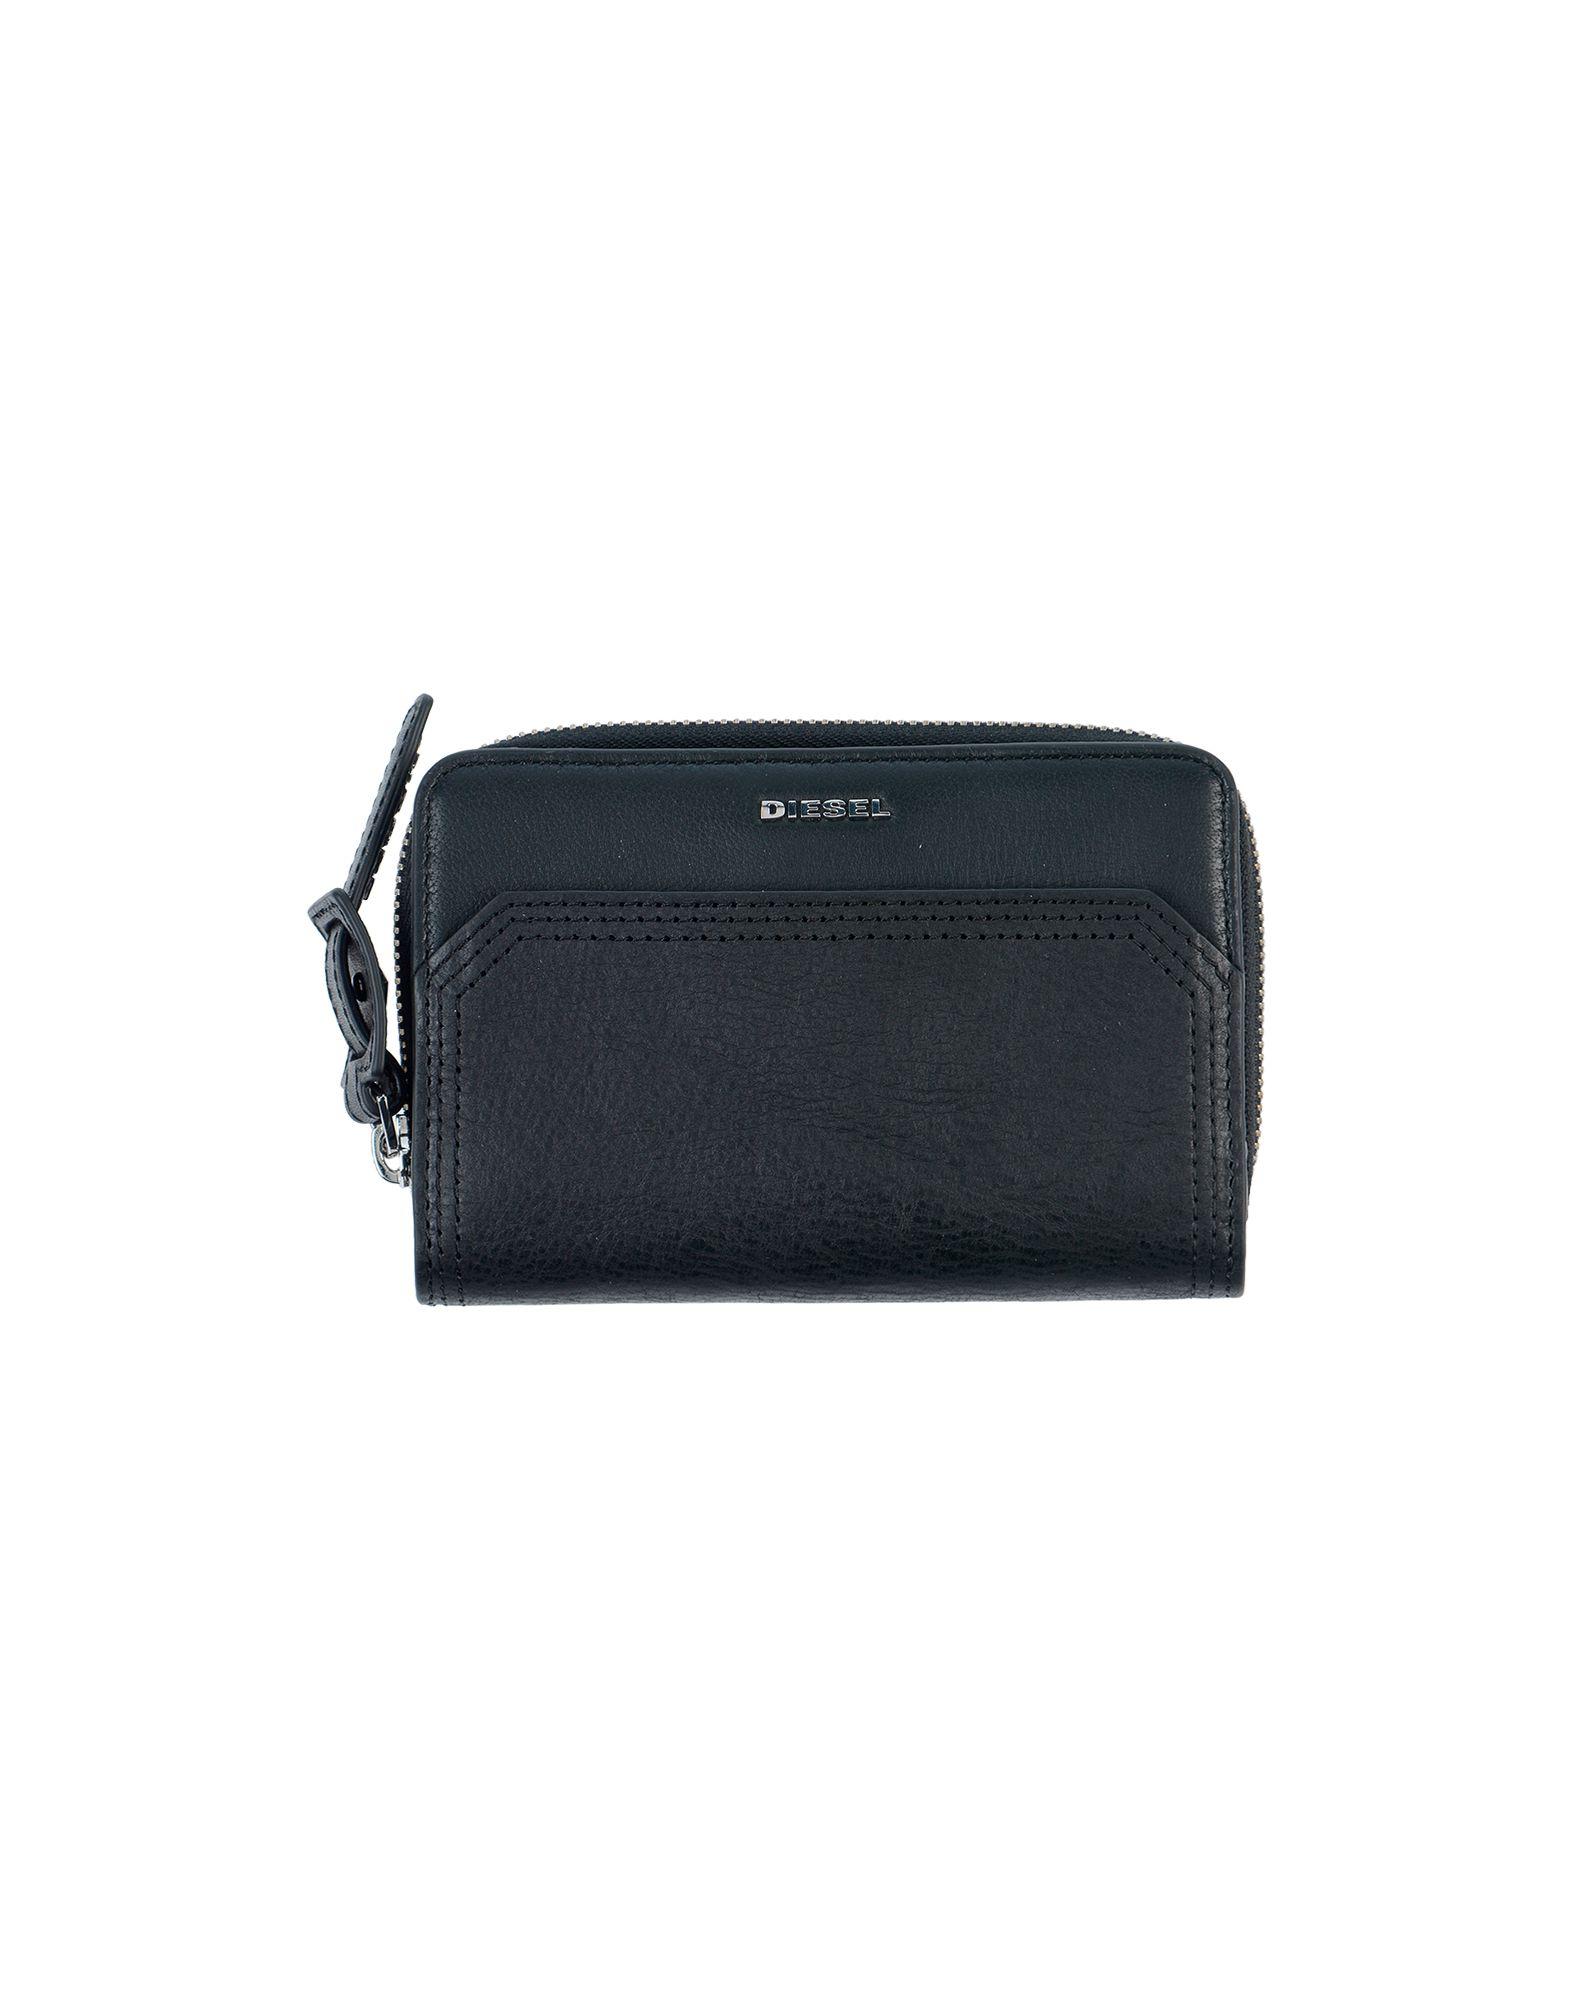 624b306ca01b ディーゼル(DIESEL) 財布 | 通販・人気ランキング - 価格.com